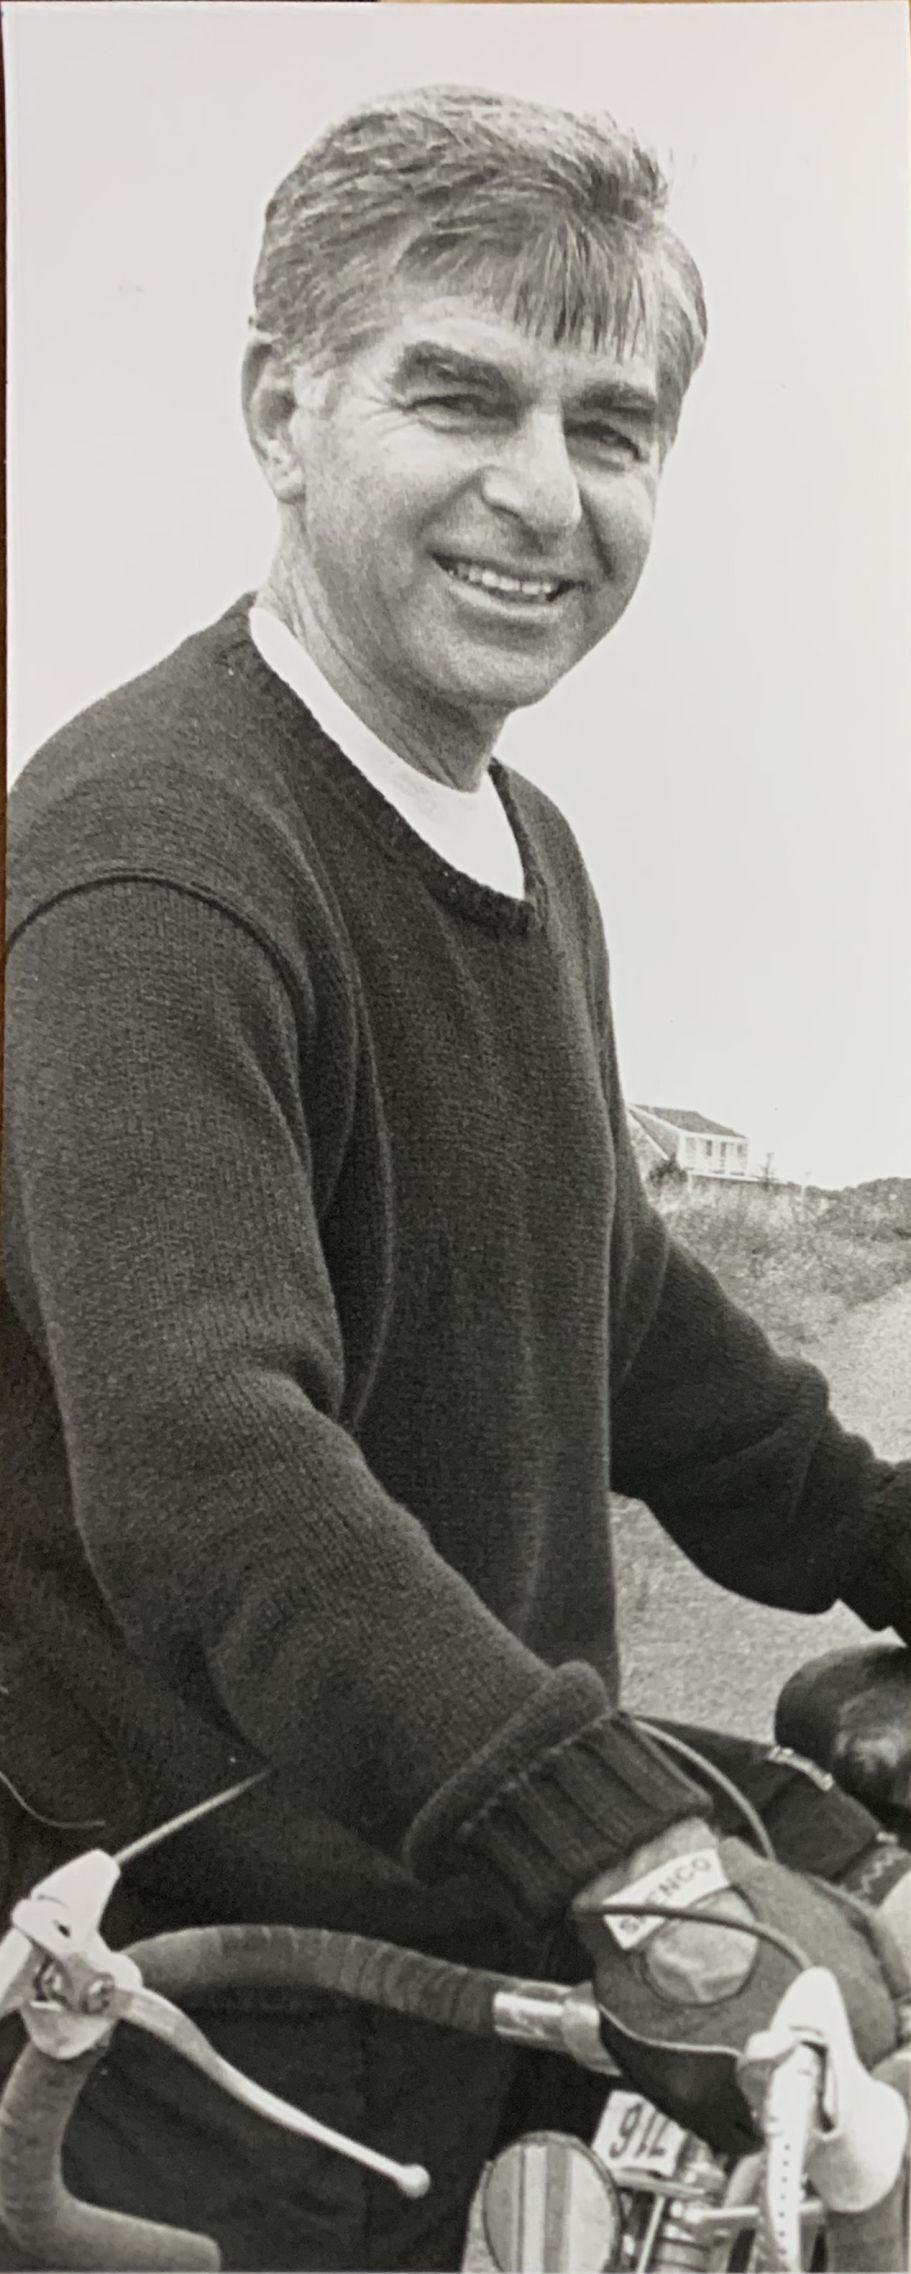 Mike Dukakis